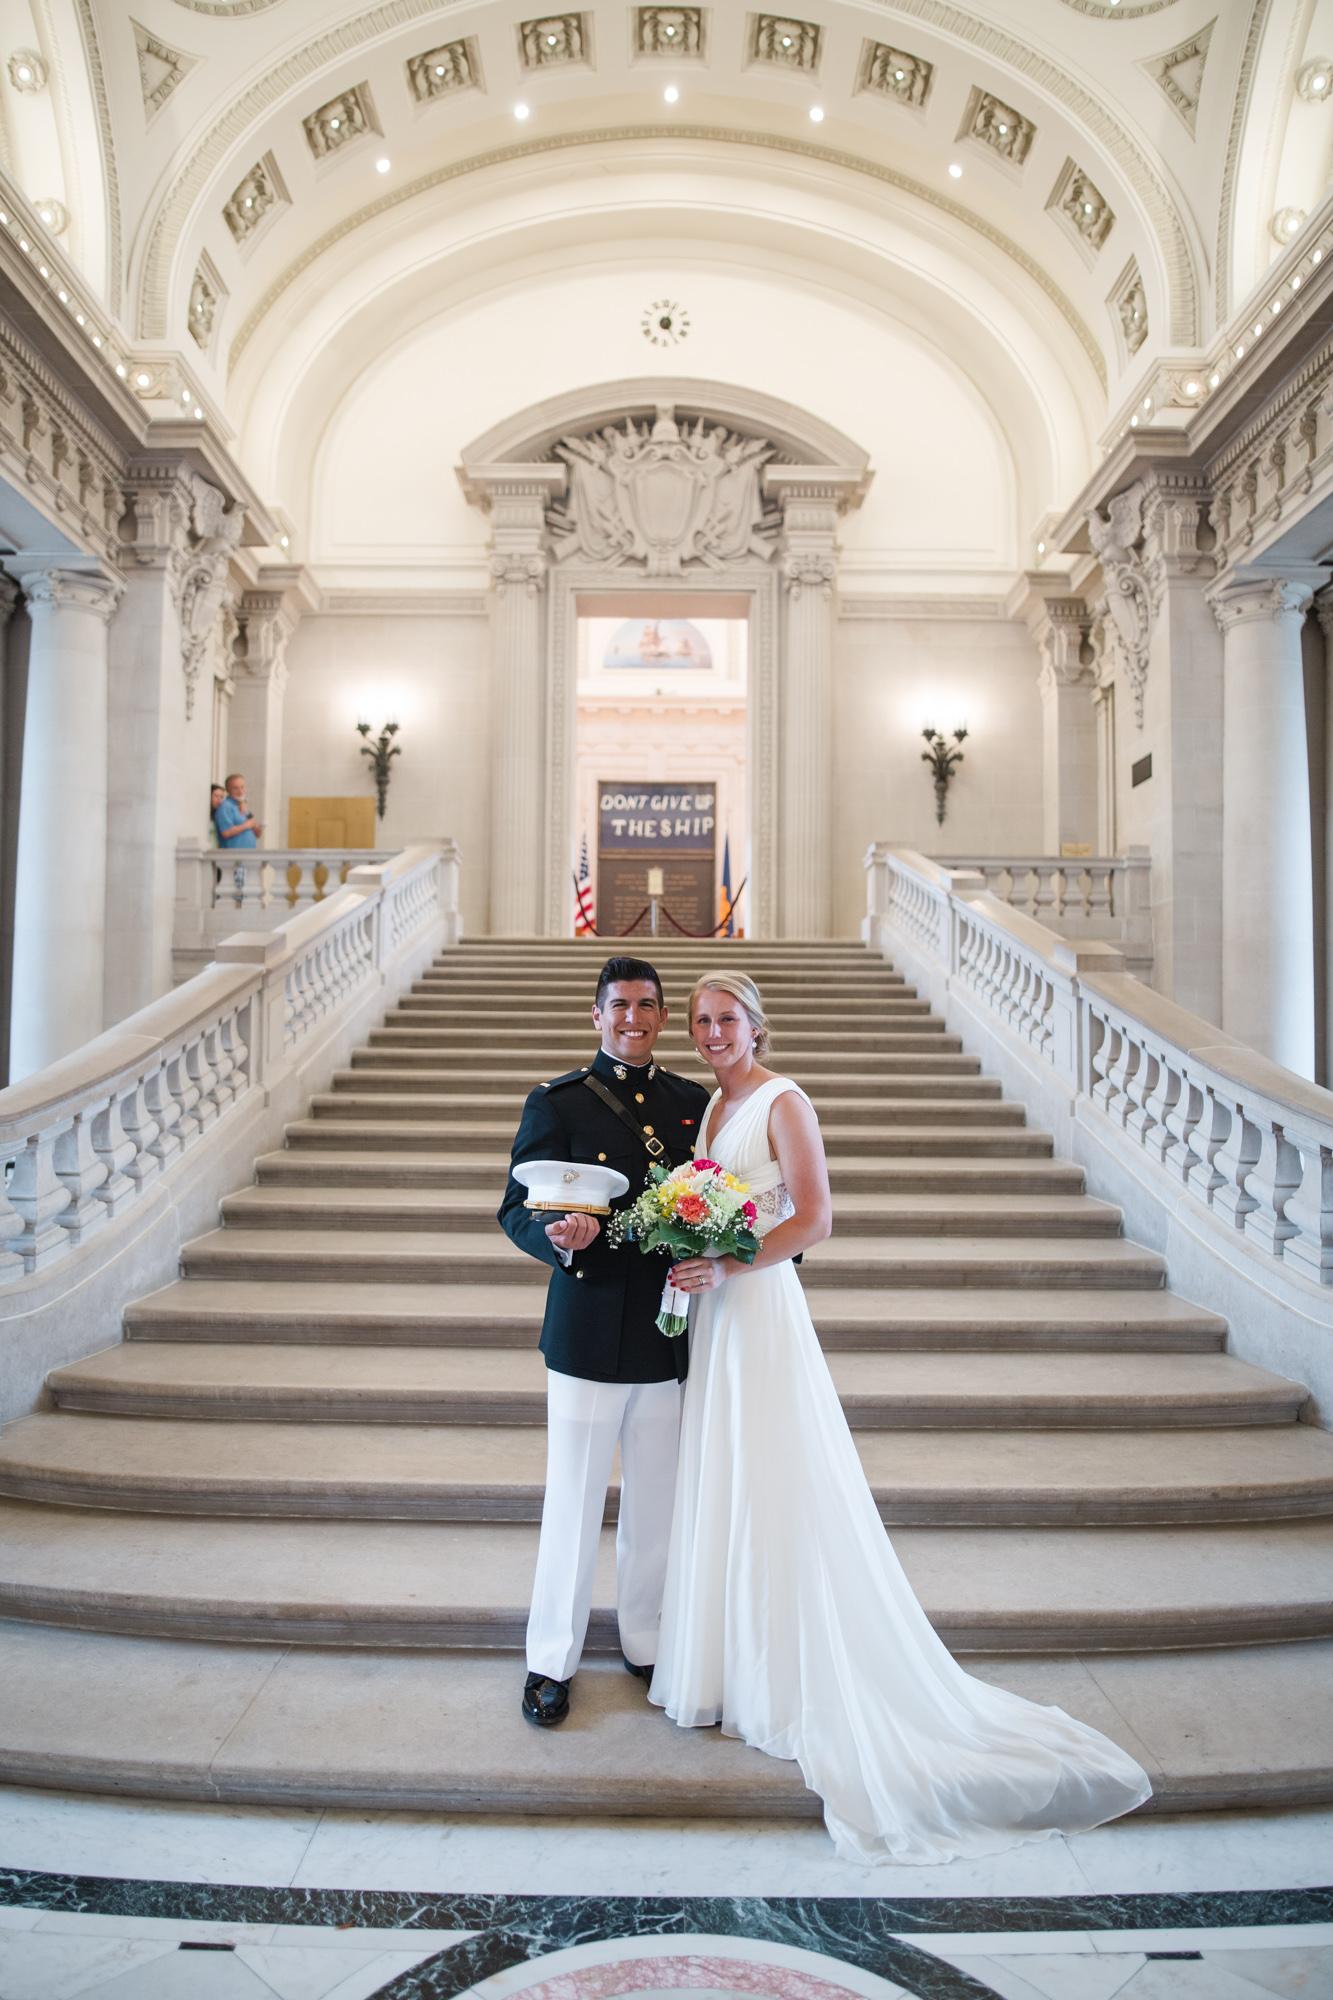 2017_05_27_ray_caroline_naval_wedding-6649.jpg